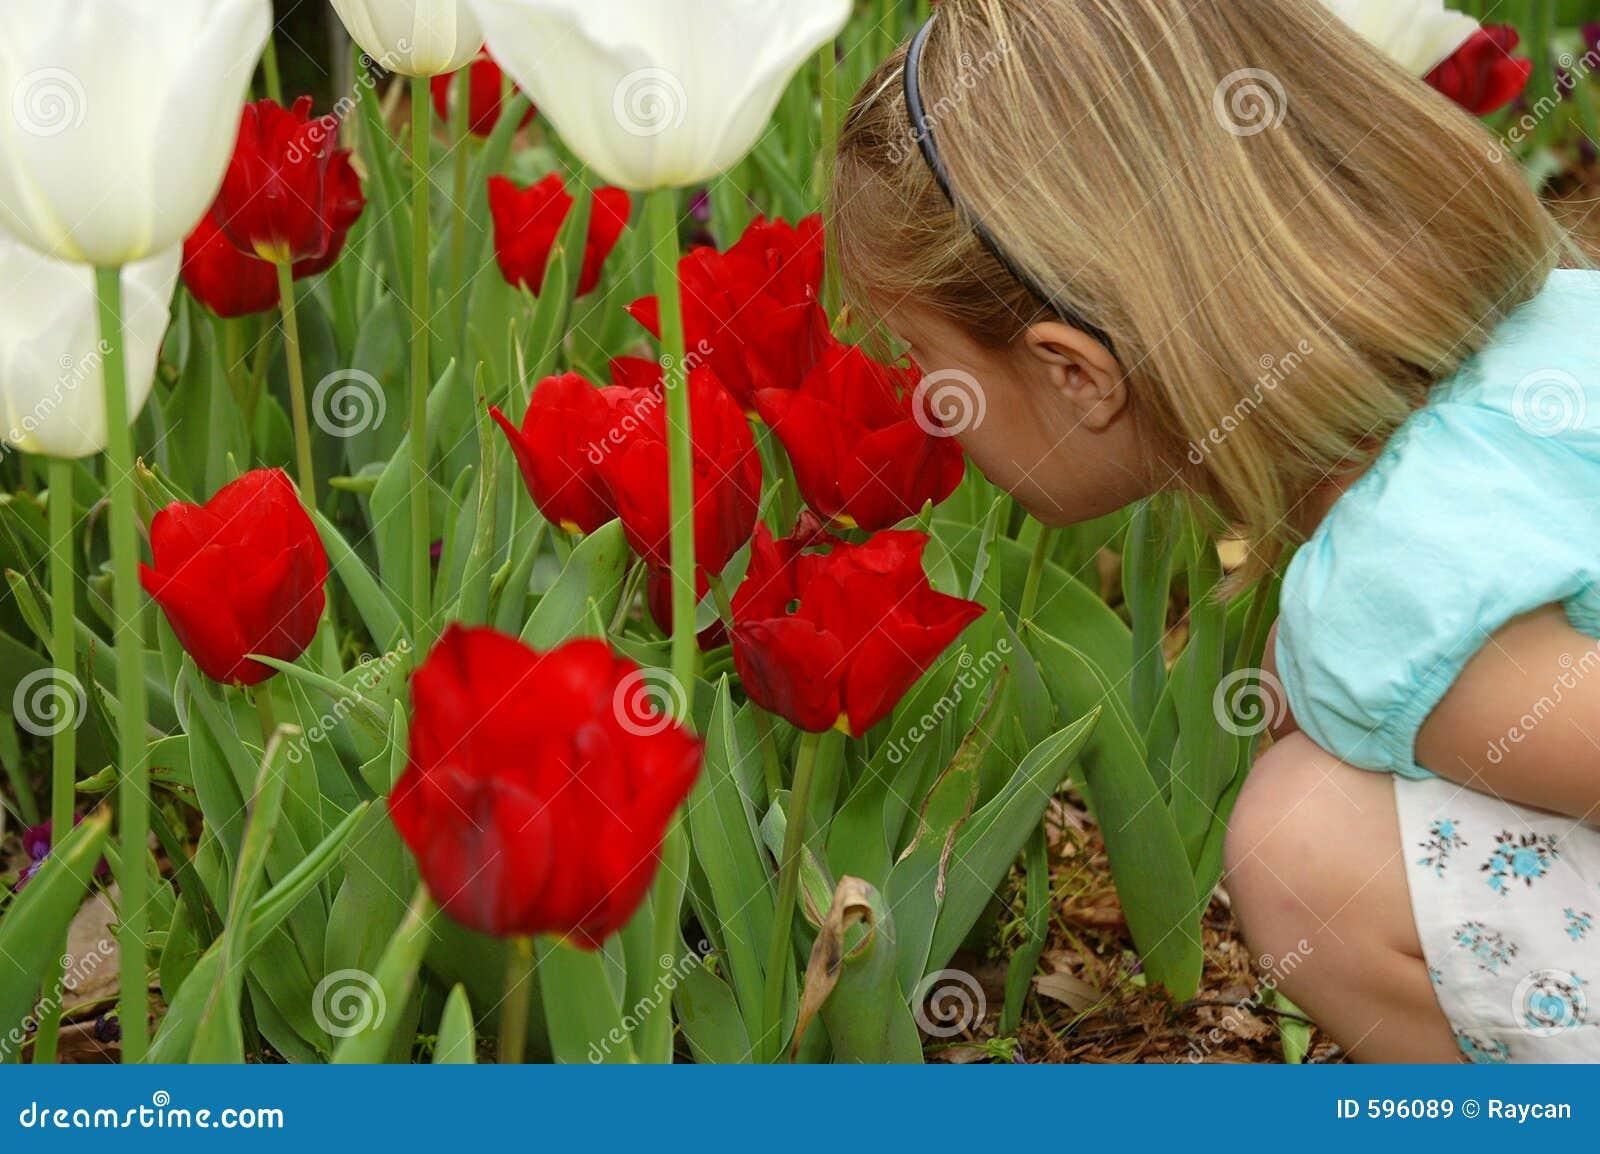 Wonderful Red Tulips